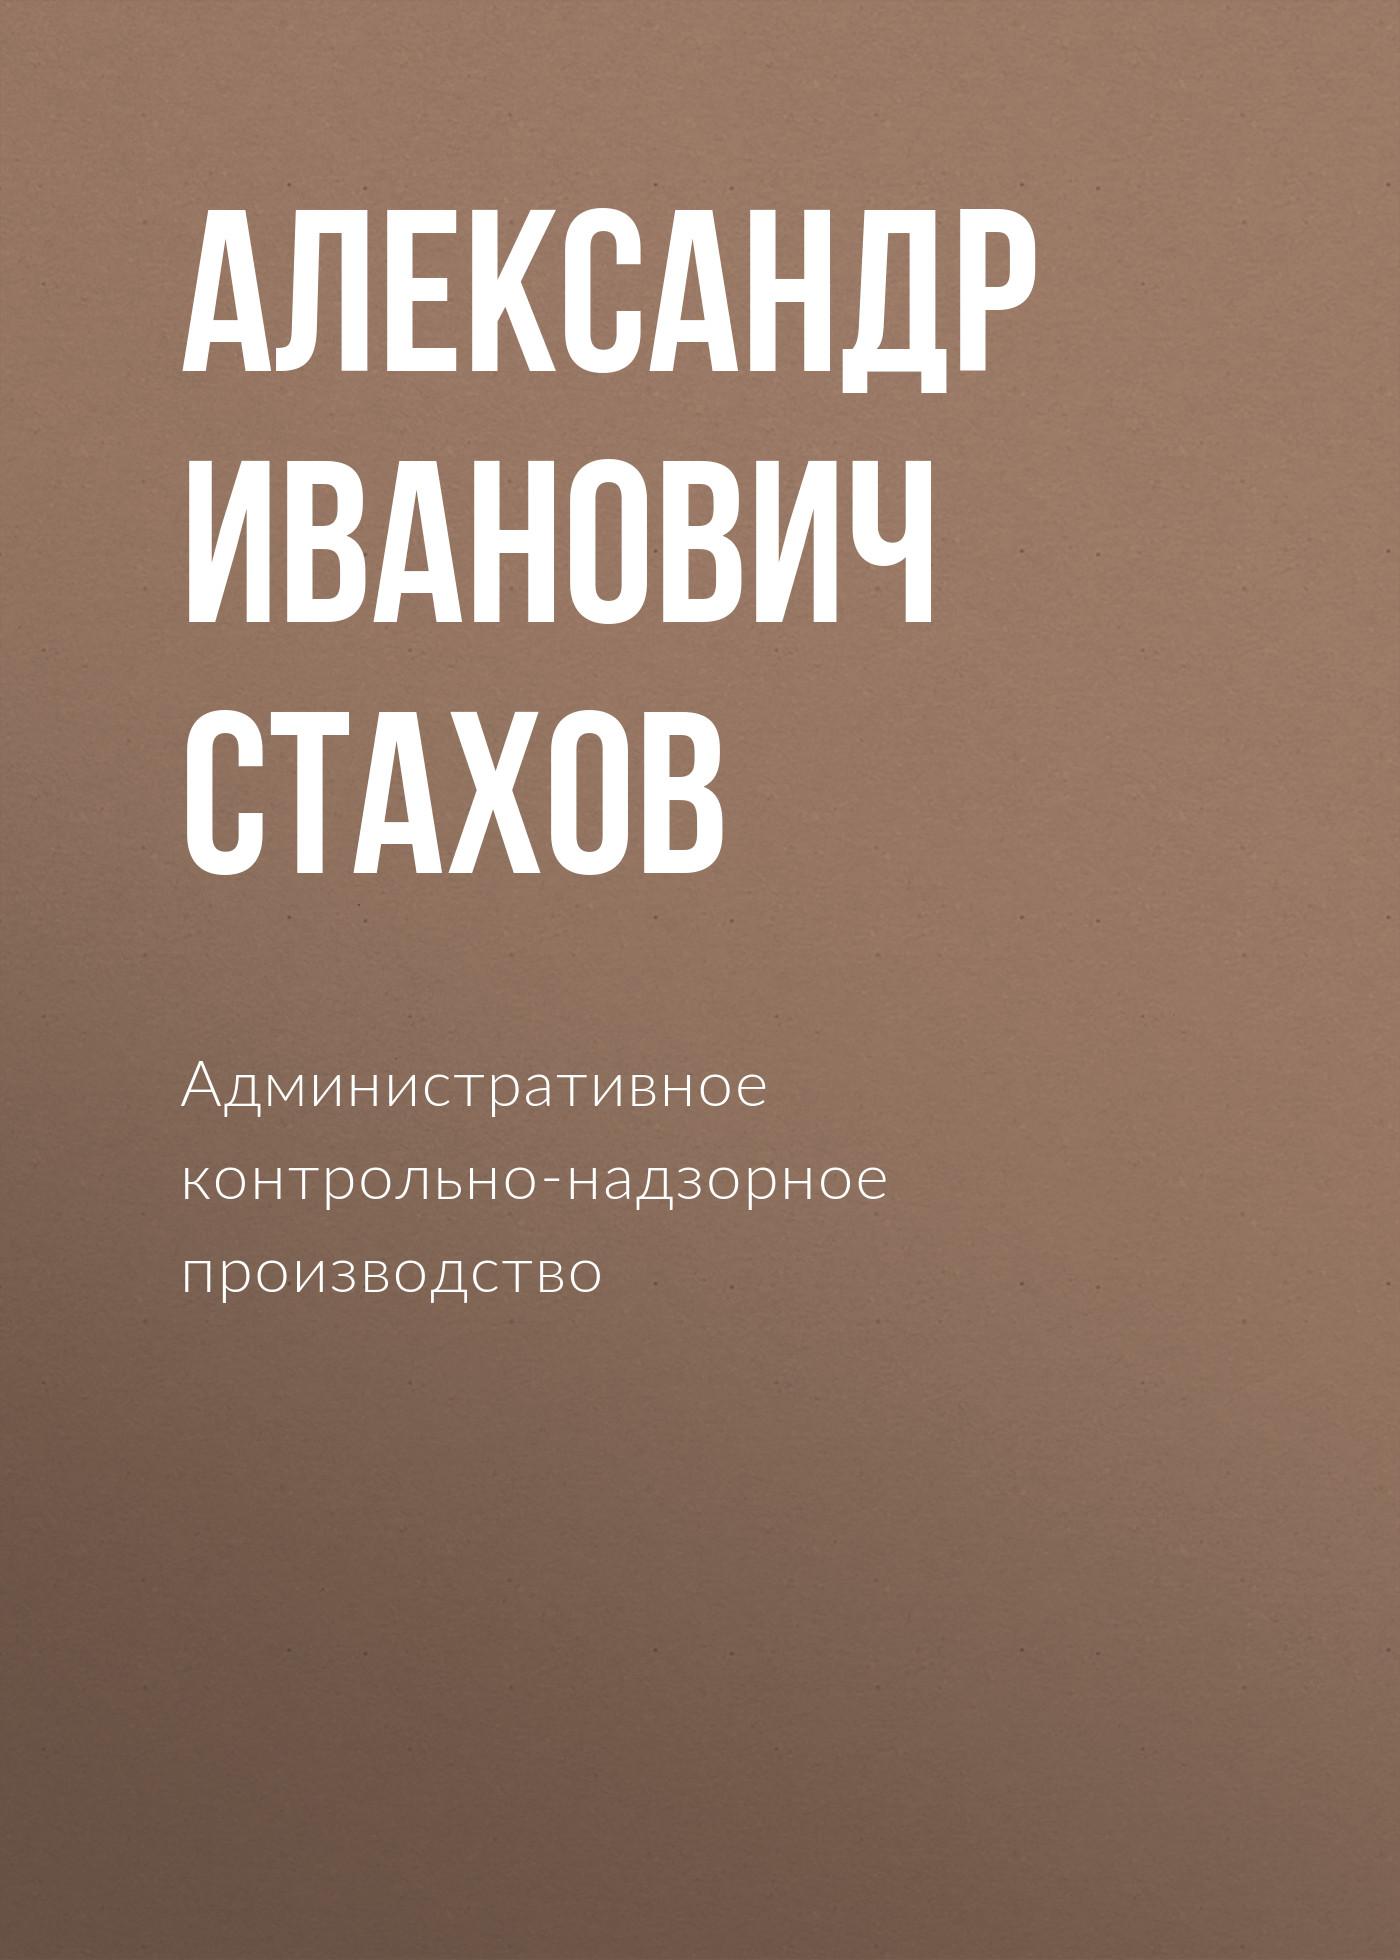 Александр Иванович Стахов Административное контрольно-надзорное производство